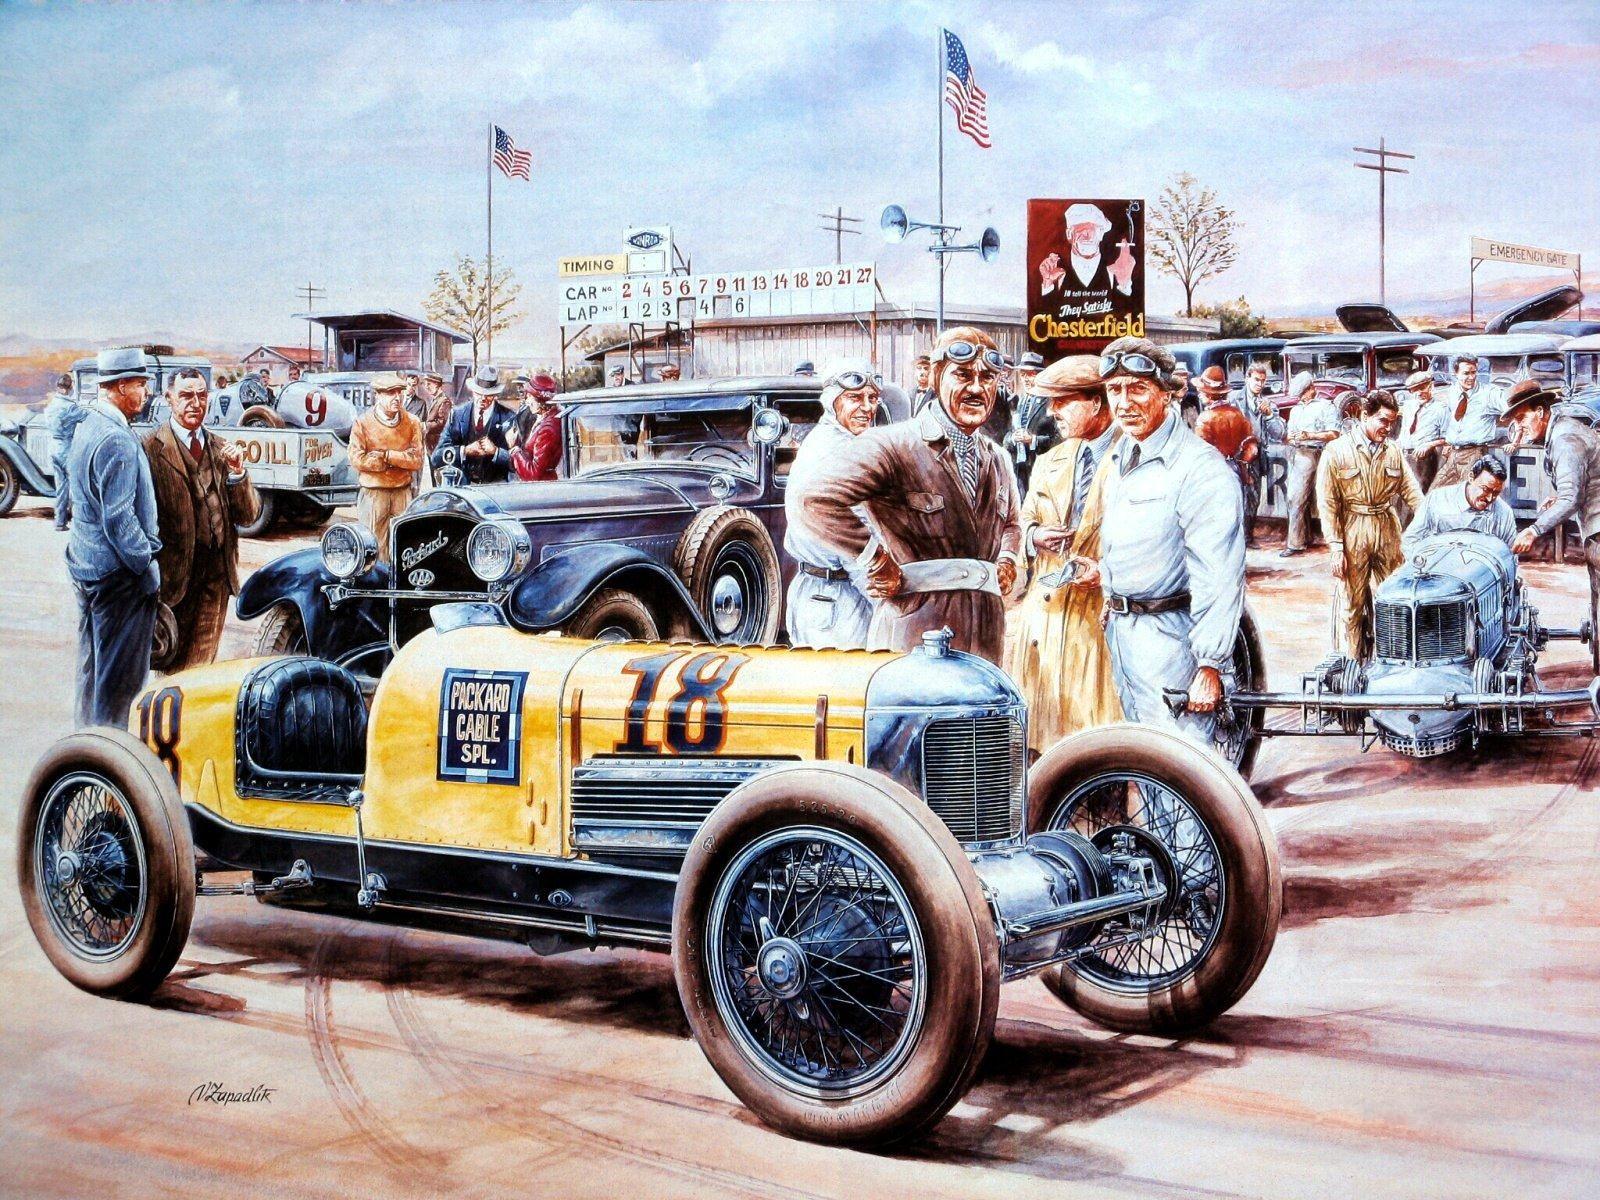 Best Vaclav Images On Pinterest Vintage Cars Automotive Art